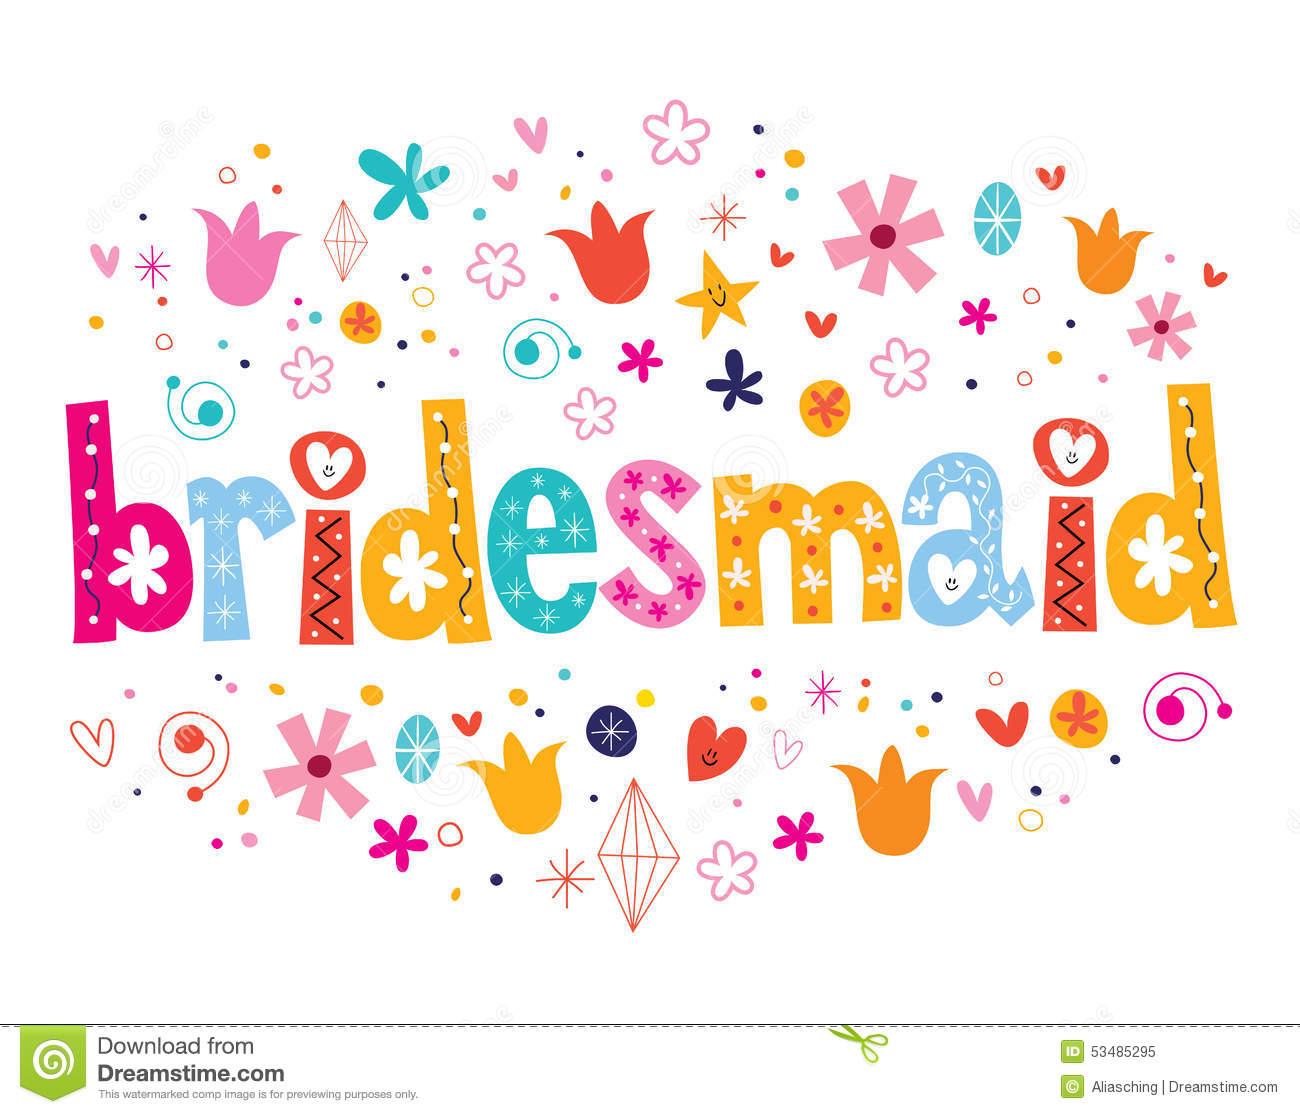 Bridesmaids Clip Art | Clipart Panda - Free Clipart Images